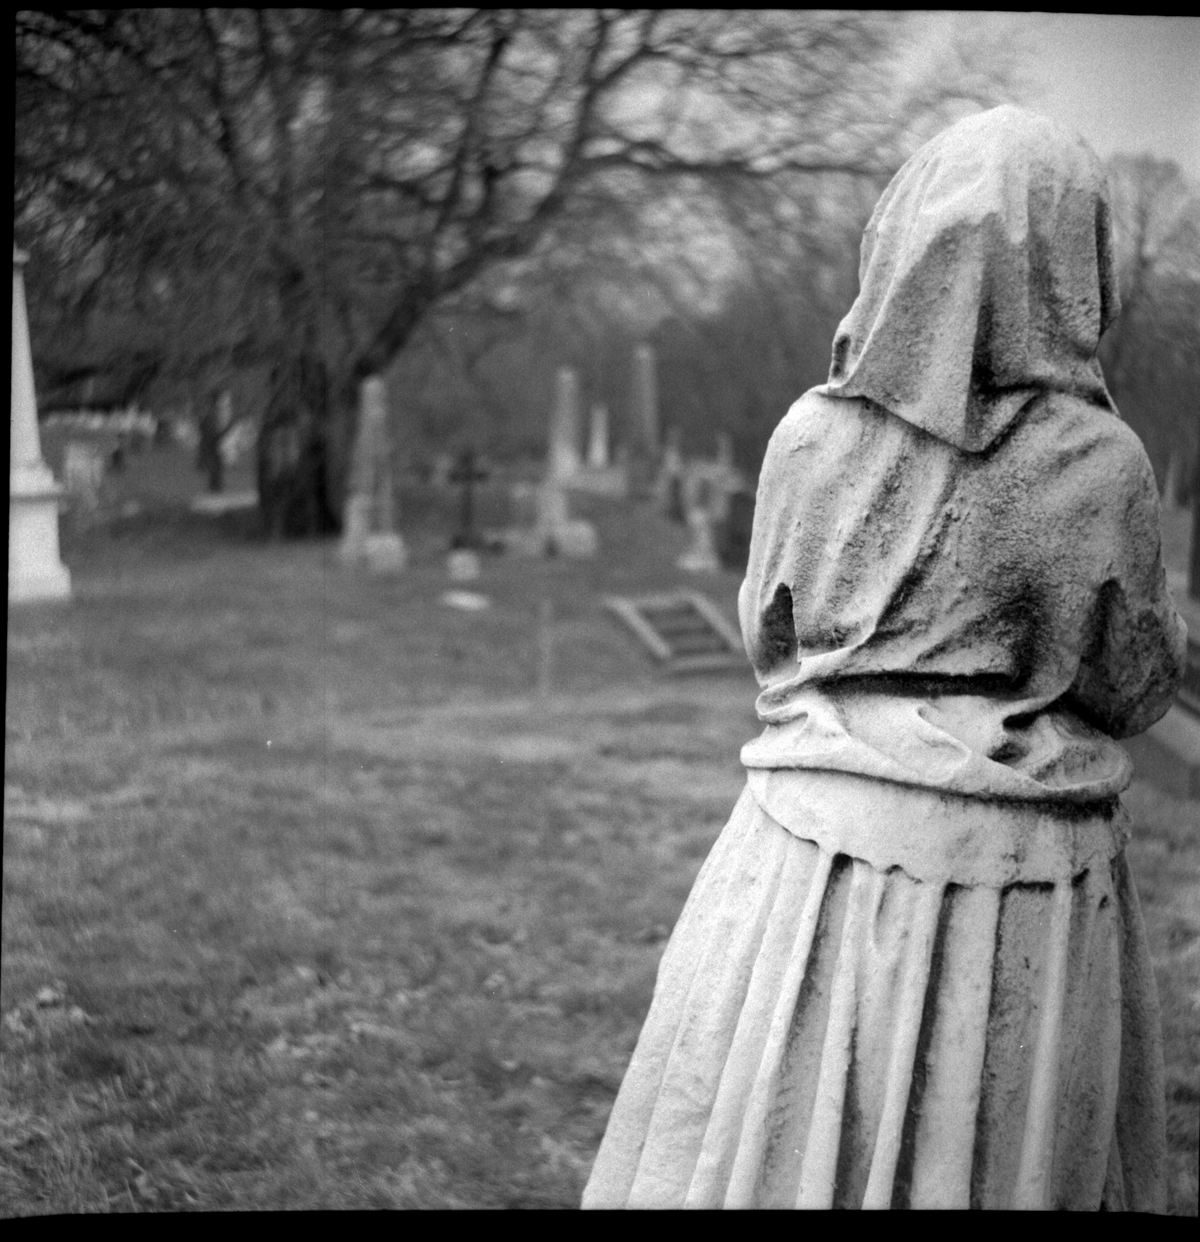 Green-Wood Cemetery, Brooklyn New York